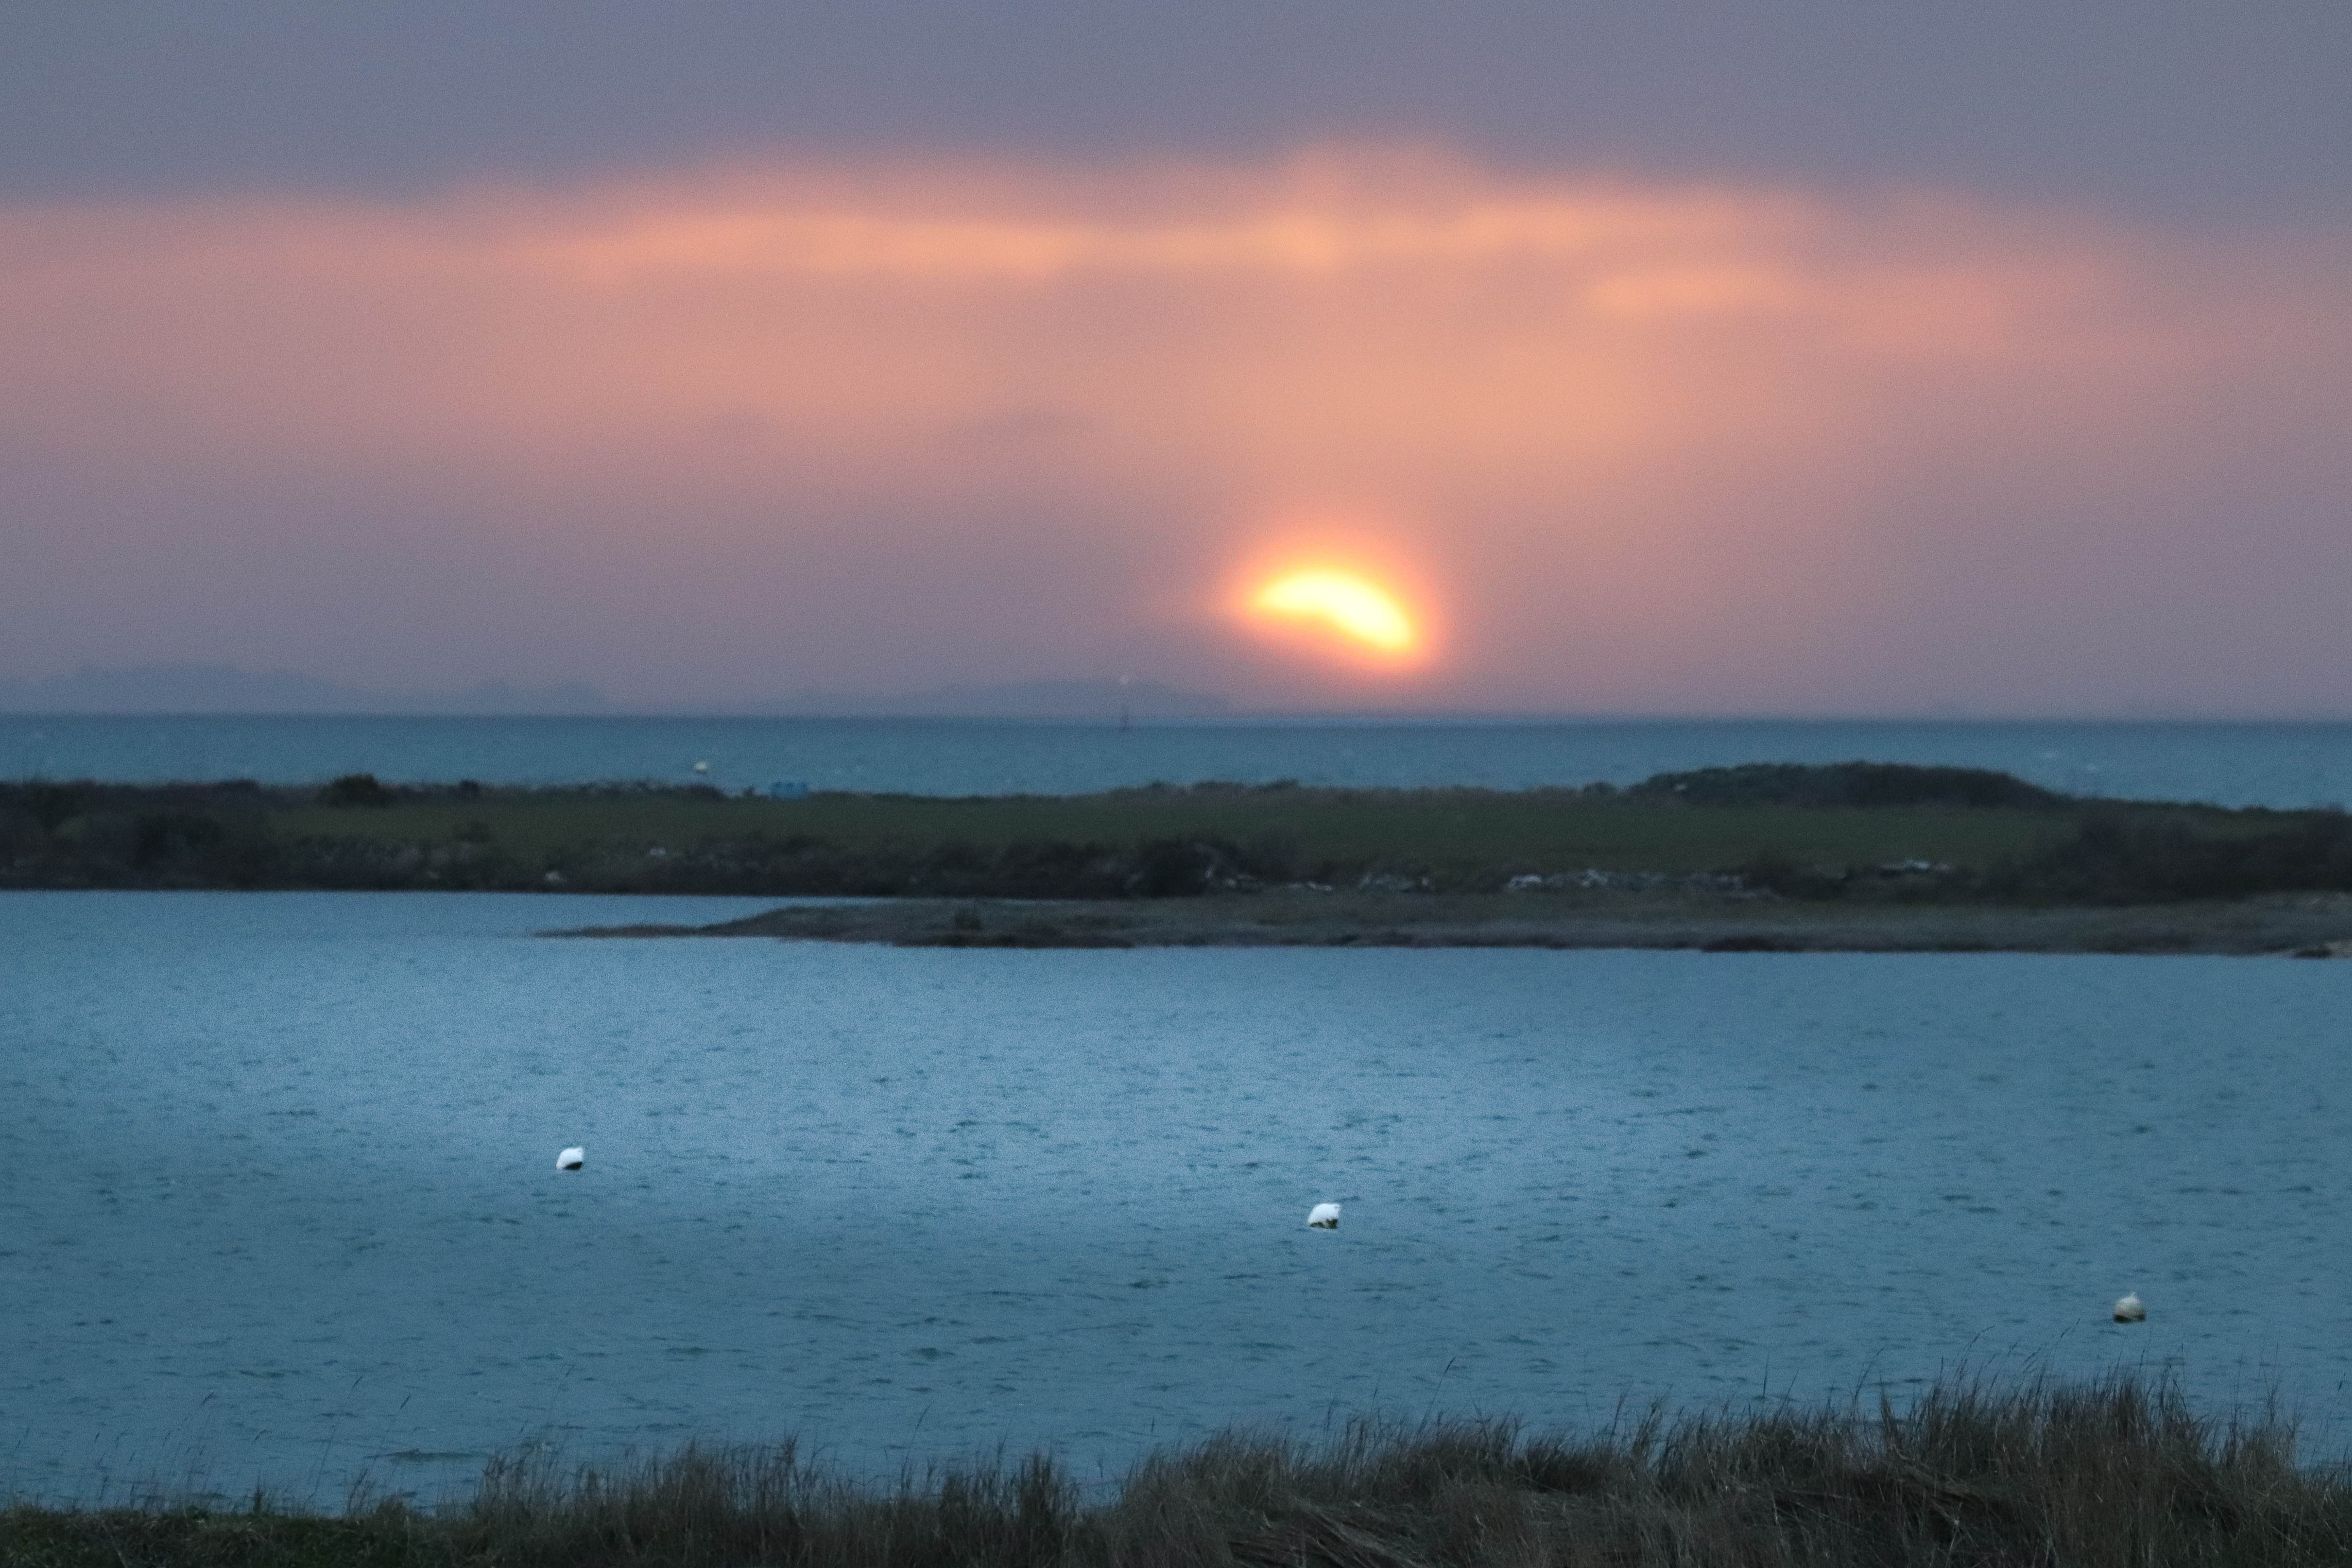 La Baie de Quiberon et W. Turner 3, 3 mars 18